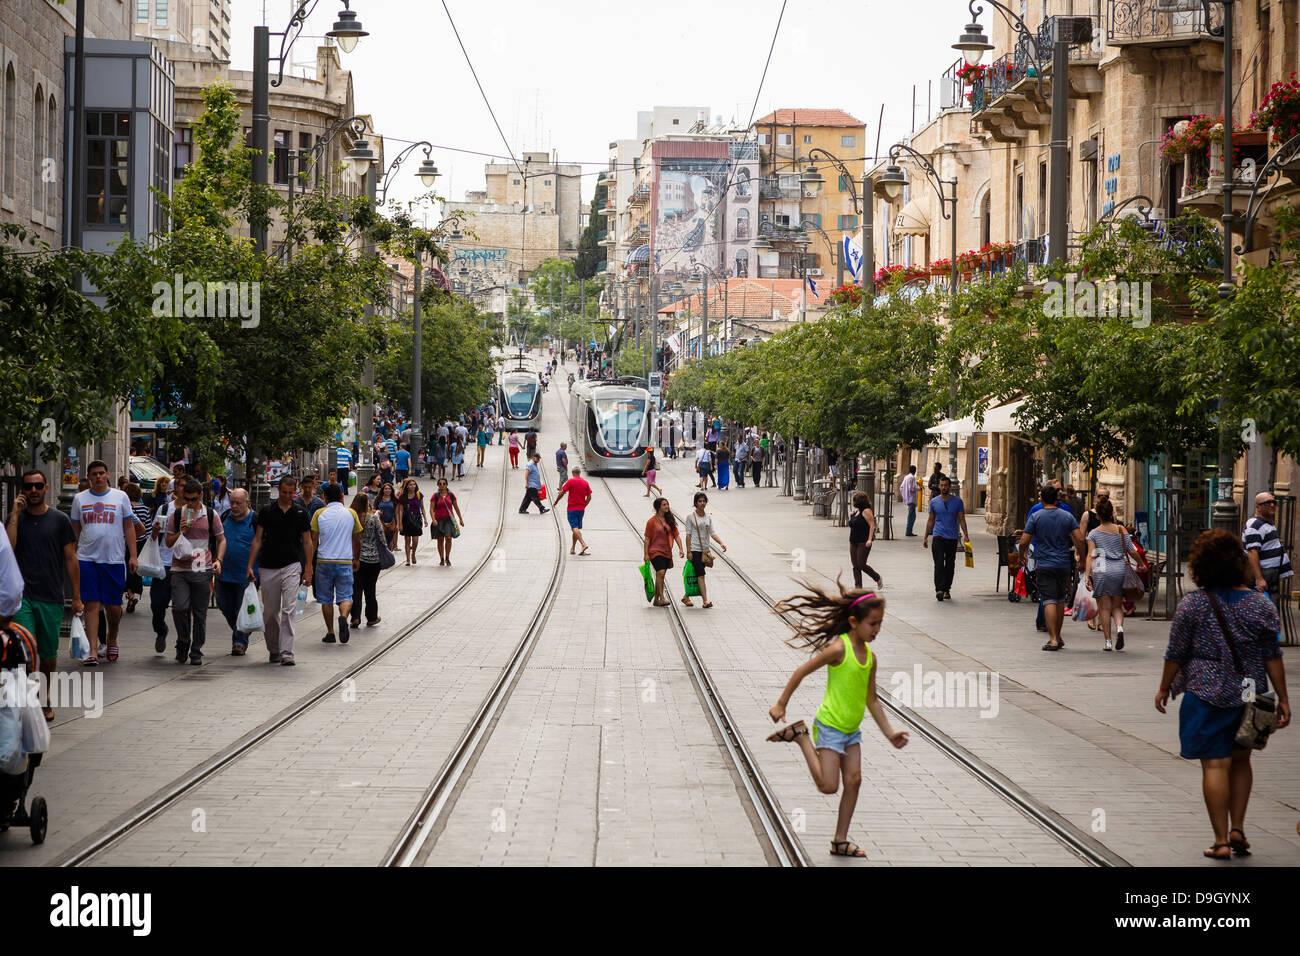 Trams at Jaffa street, Jerusalem, Israel. - Stock Image